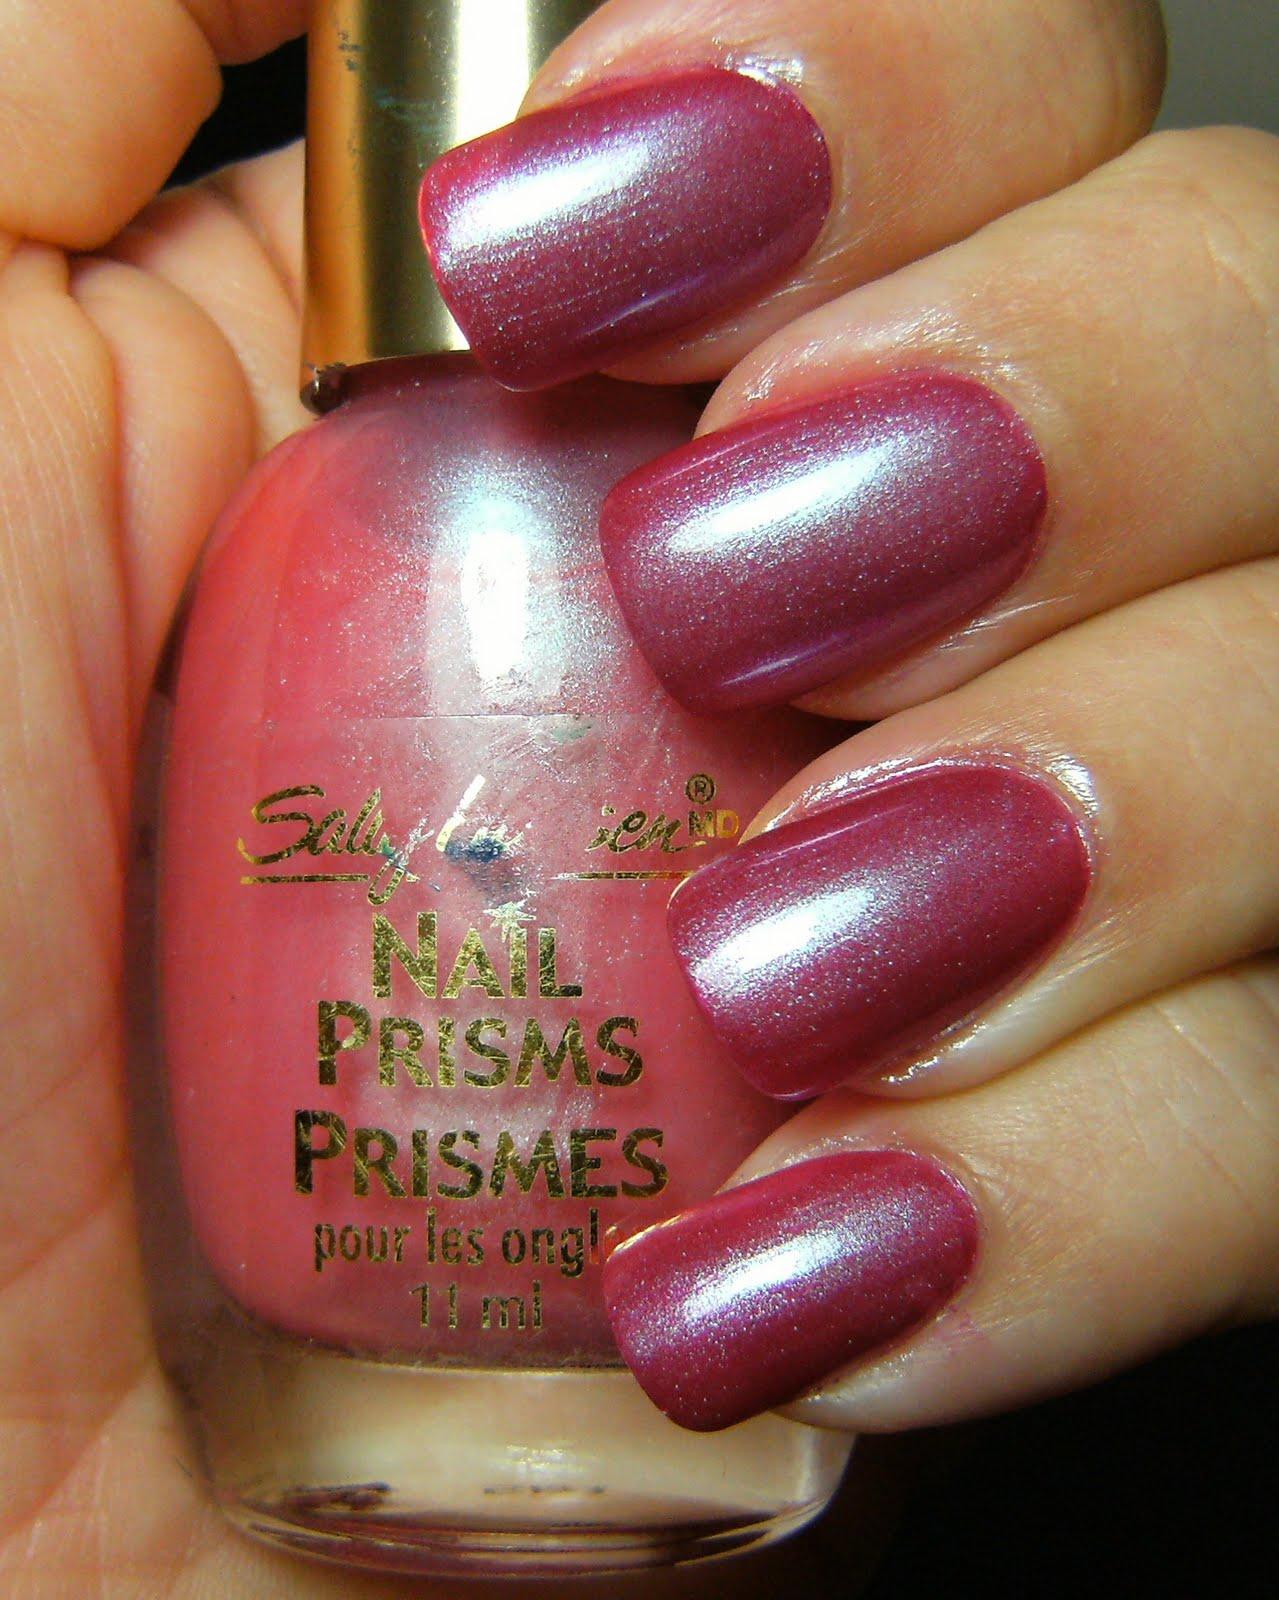 Sally Hansen Nail Prisms